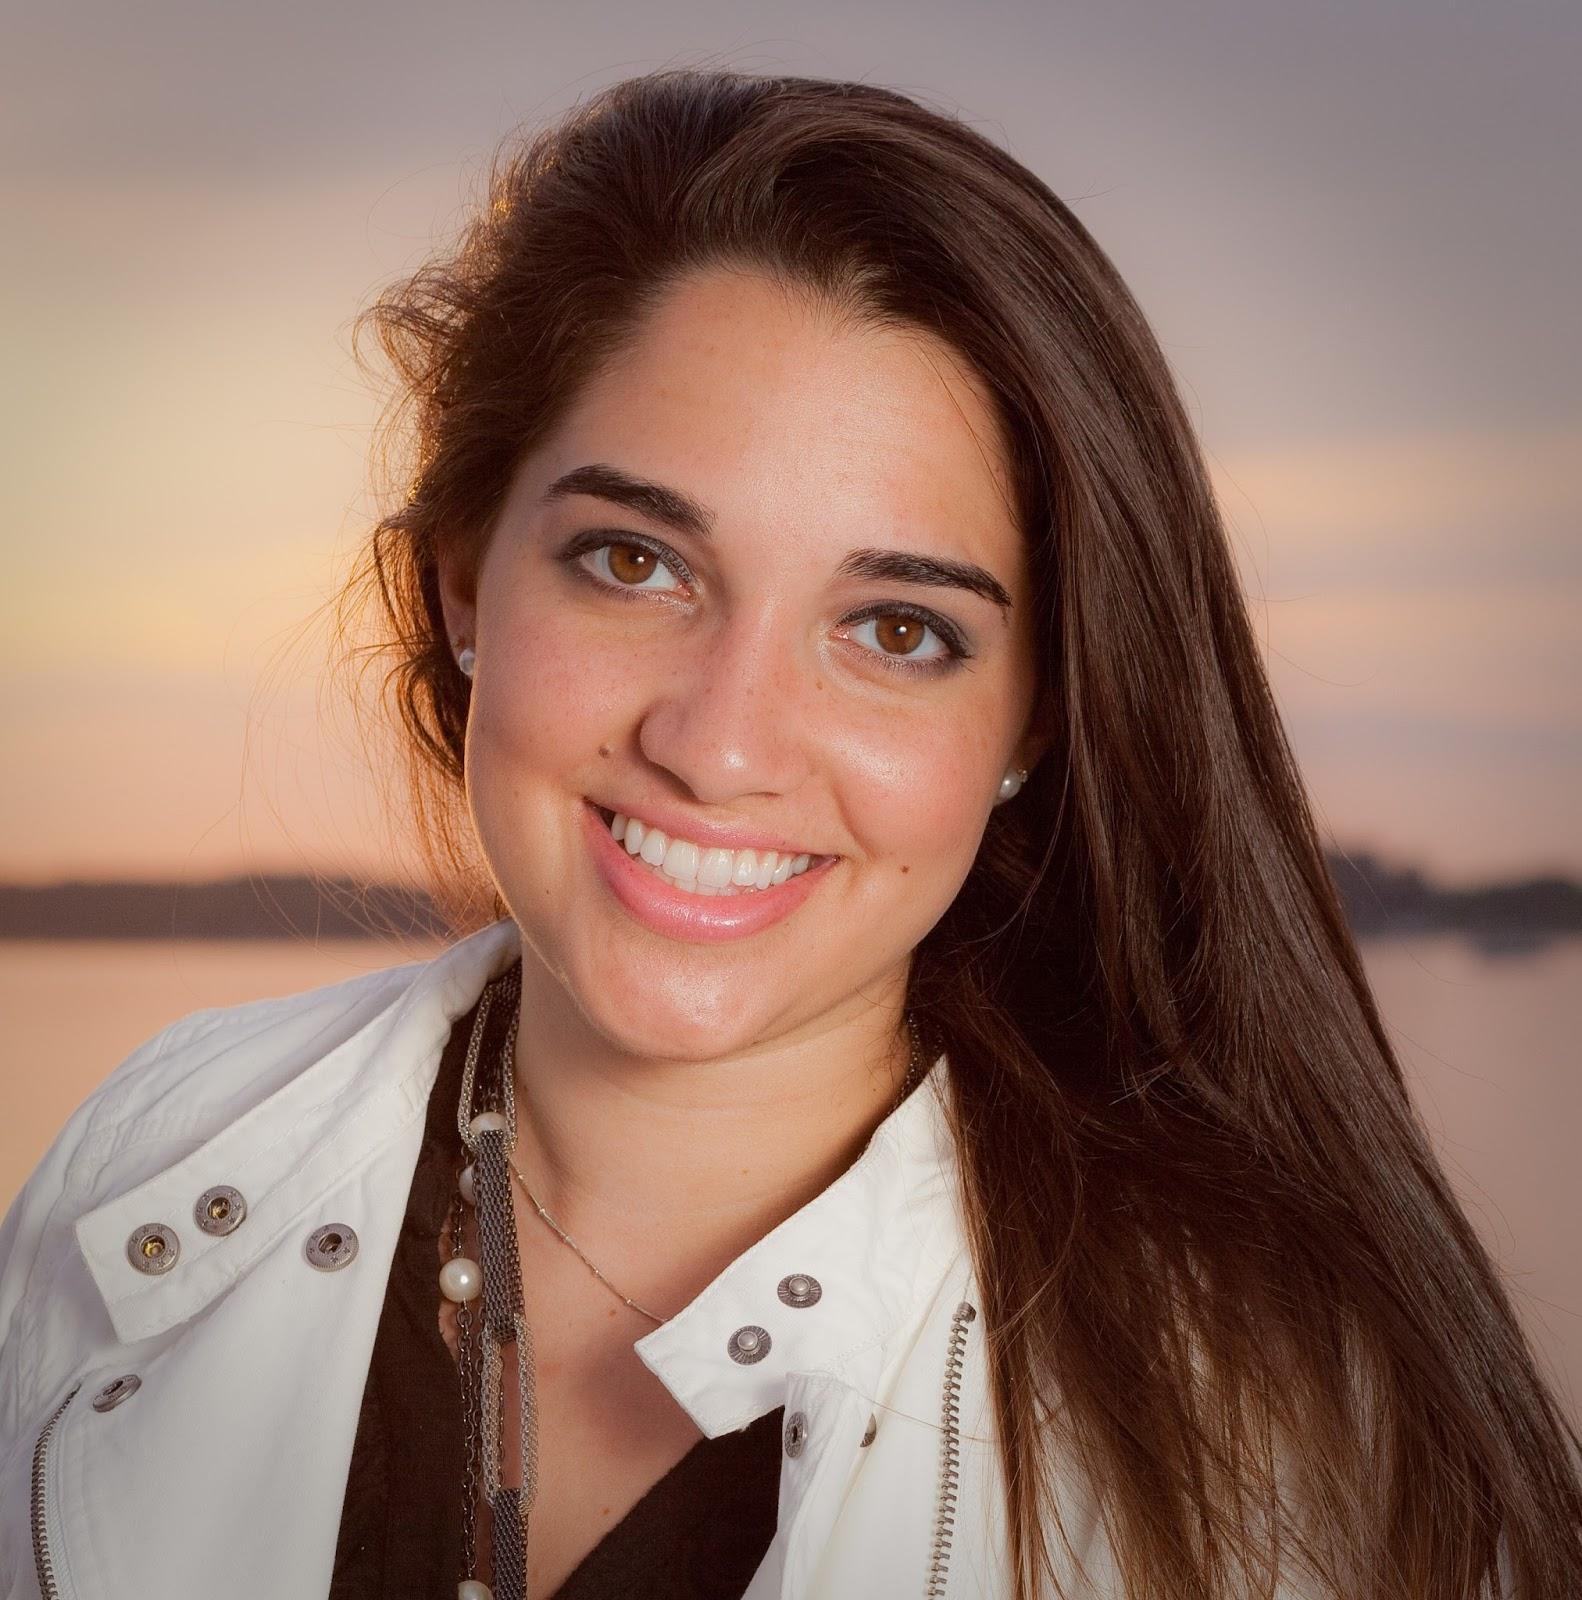 Christine Diane Garcia - christine%252Bgarcia